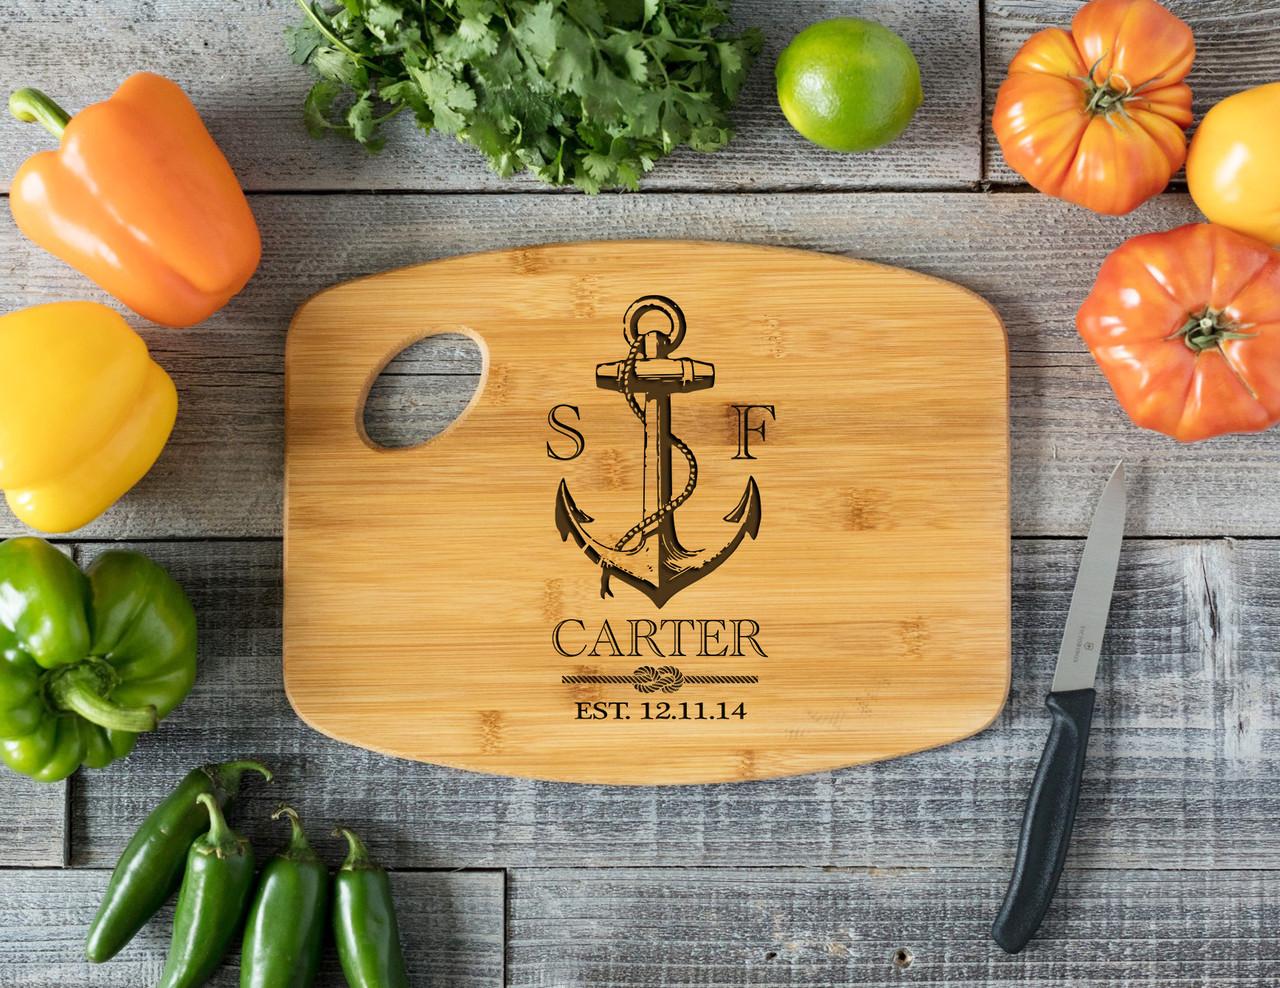 Grpn Spain - Handle Nautical Anchor Personalized Cutting Board